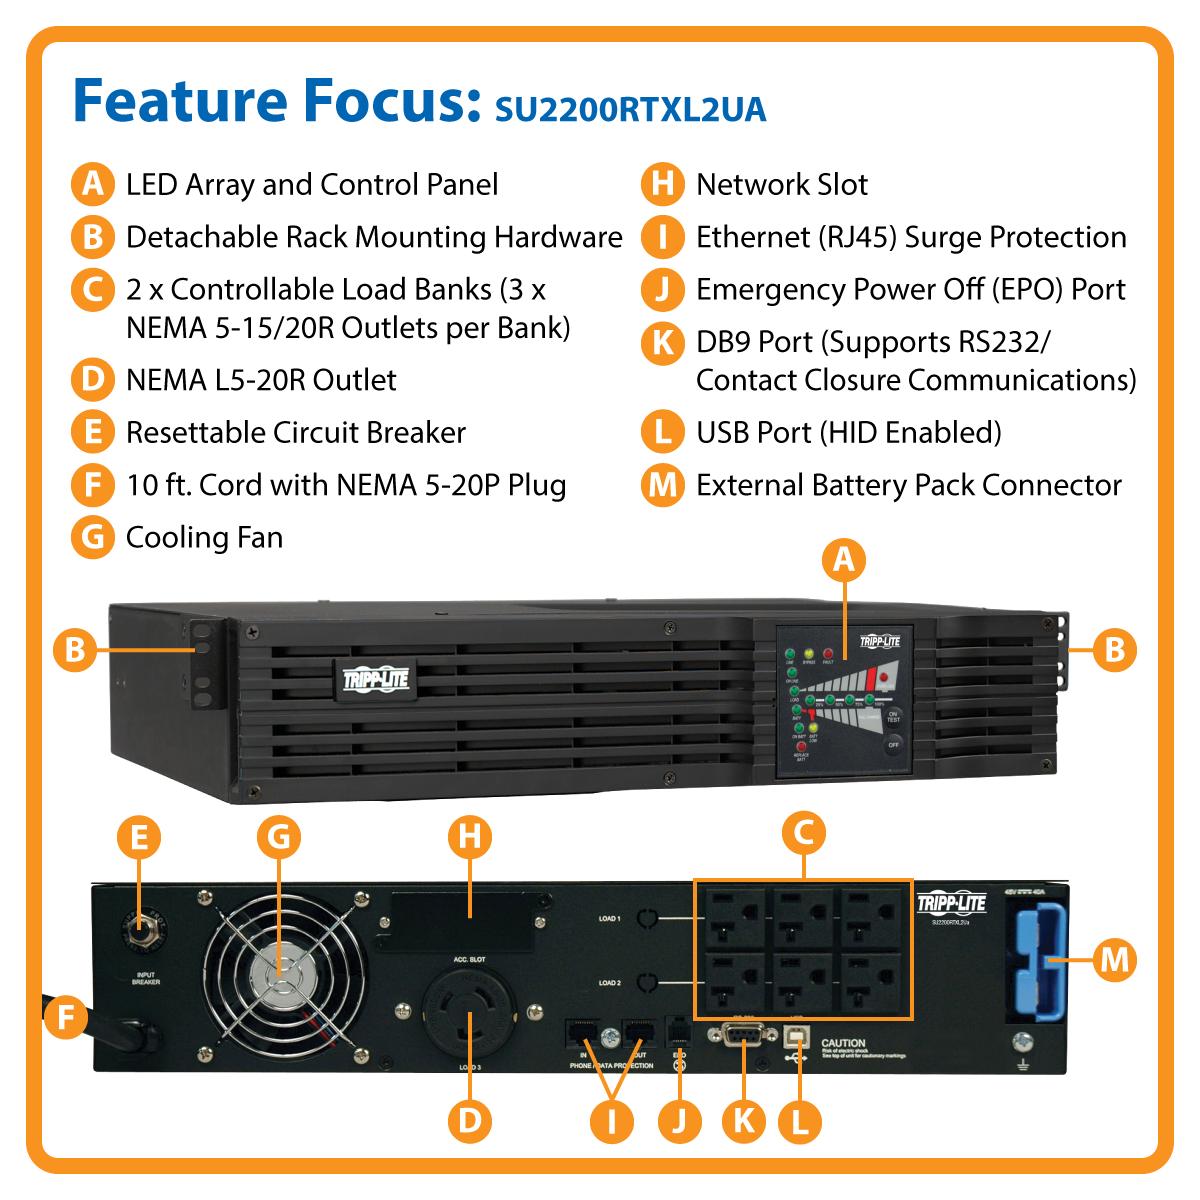 Intcomex Premiere Distributor Of A Wide Range Computer Products Apc Epo Wiring Diagram Media